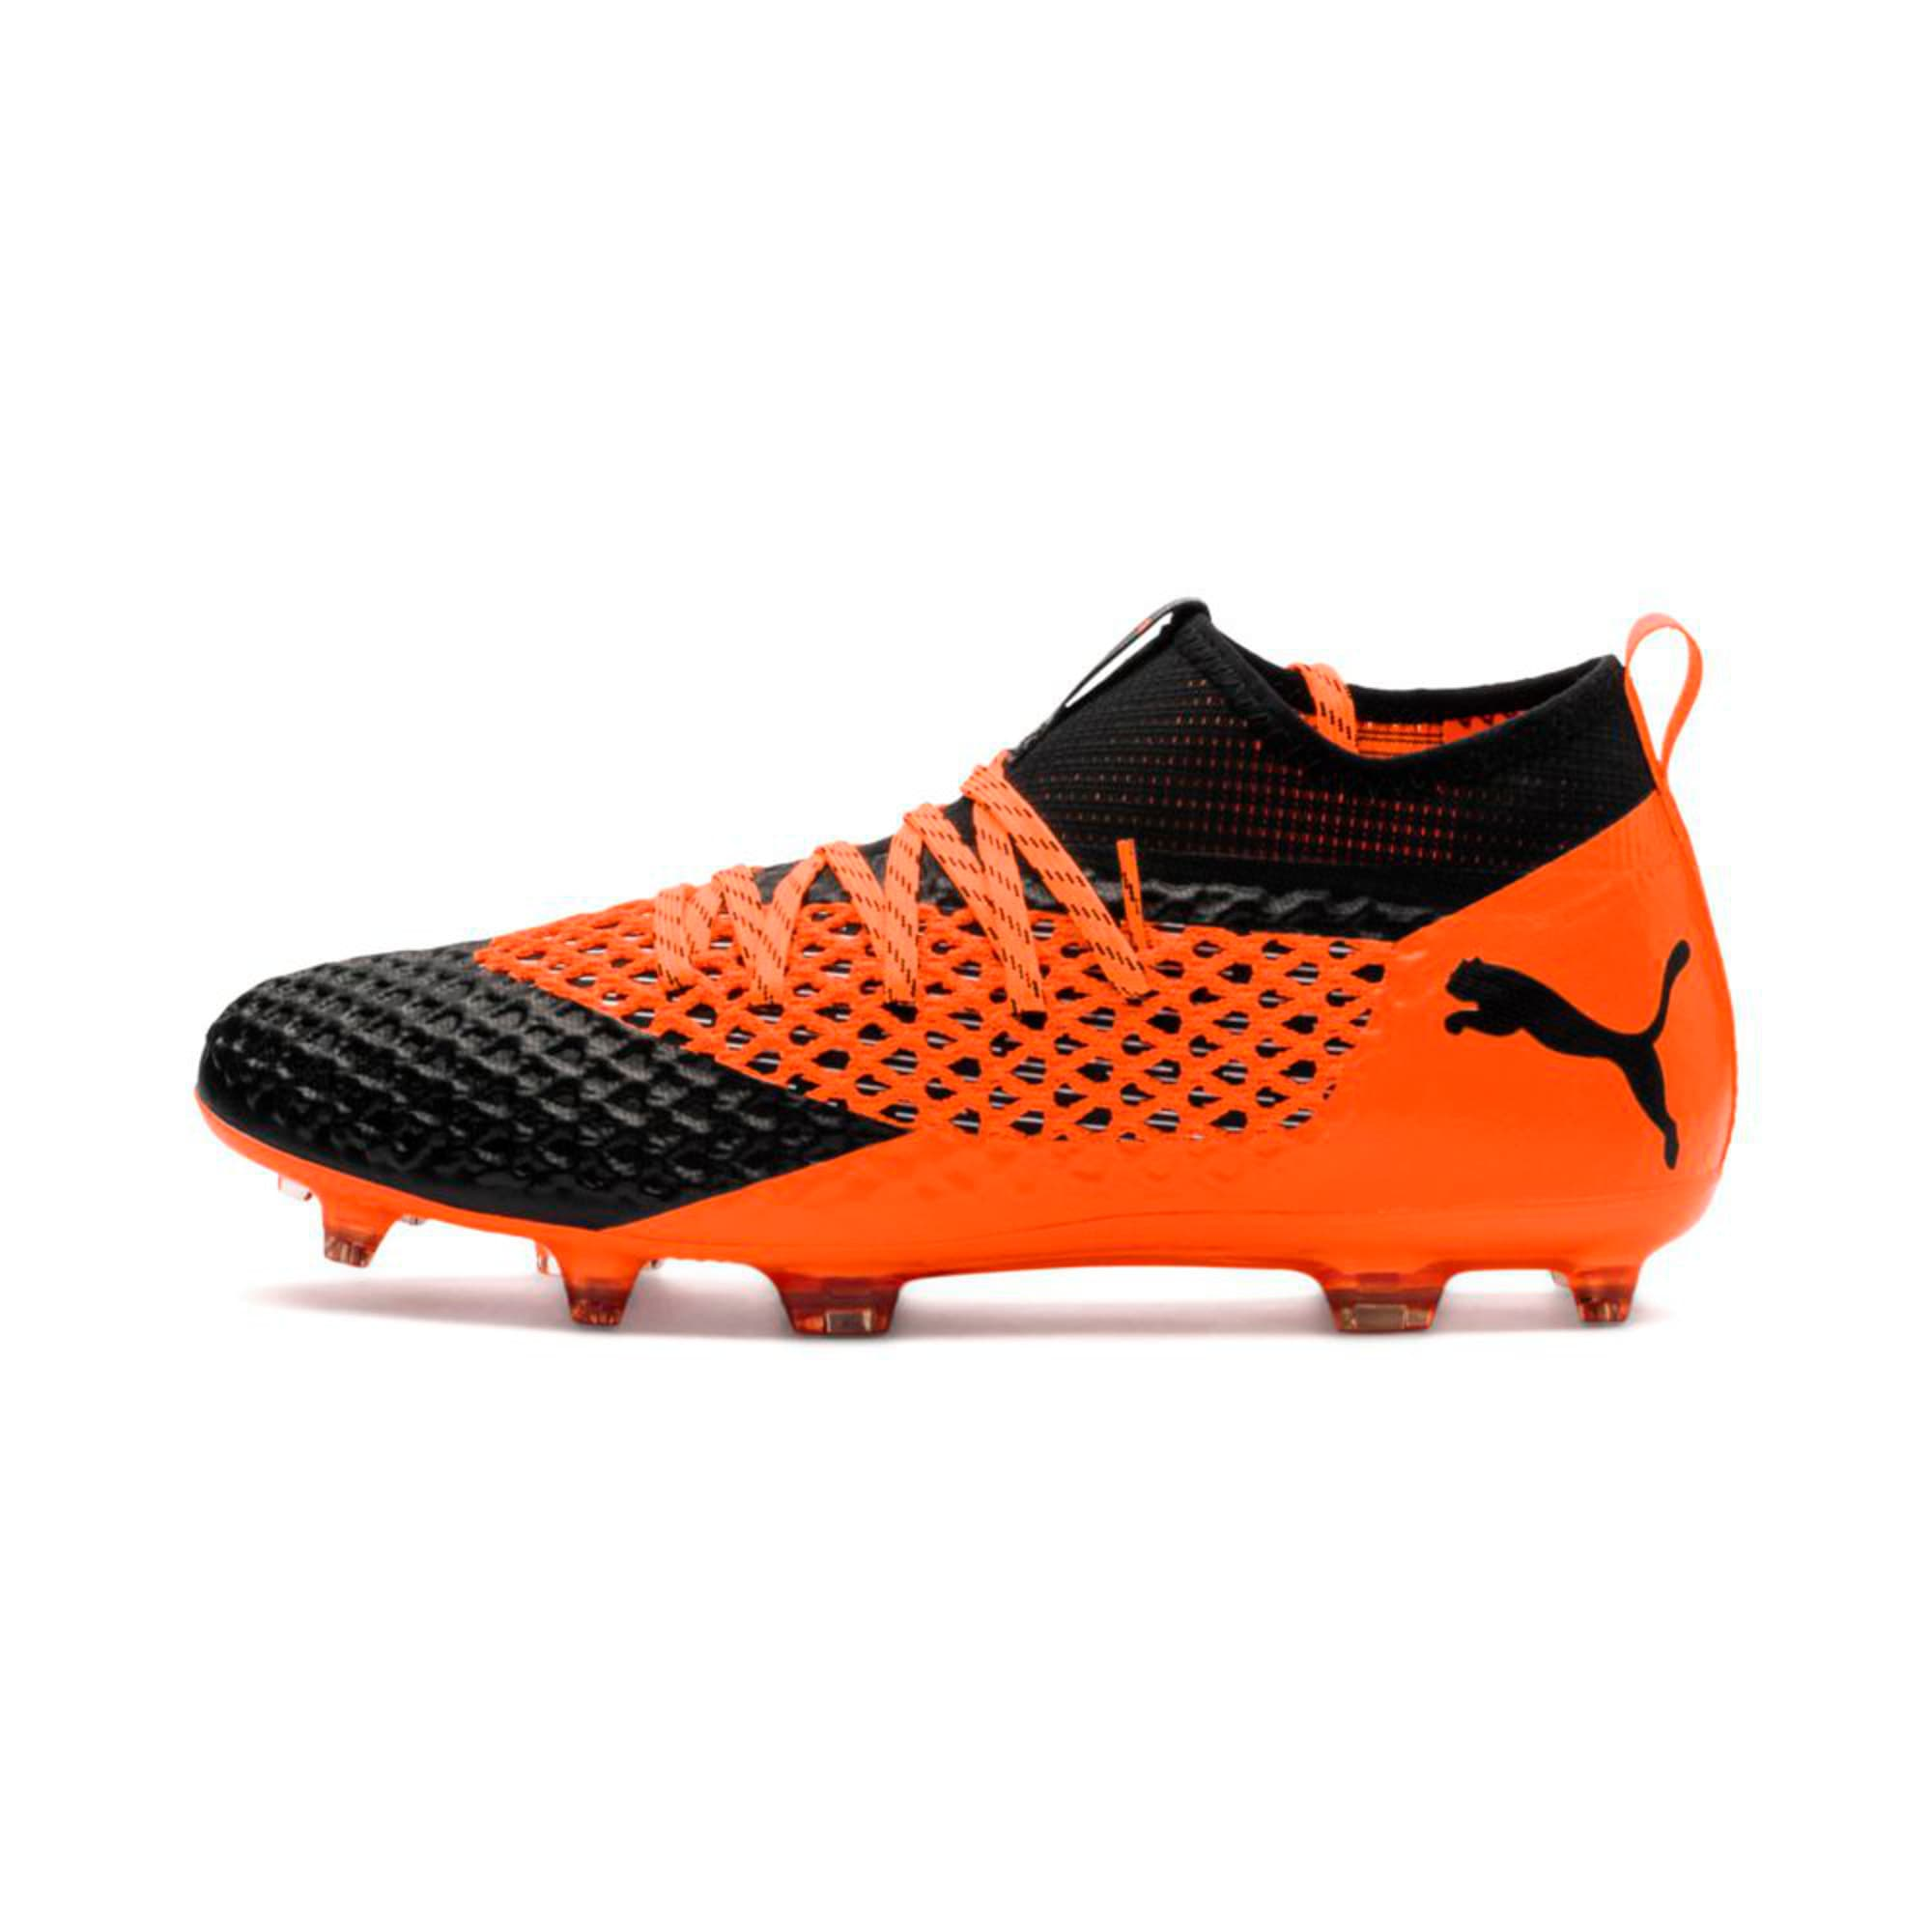 Thumbnail 1 of FUTURE 2.2 NETFIT FG/AG  Football Boots, Black-Orange, medium-IND